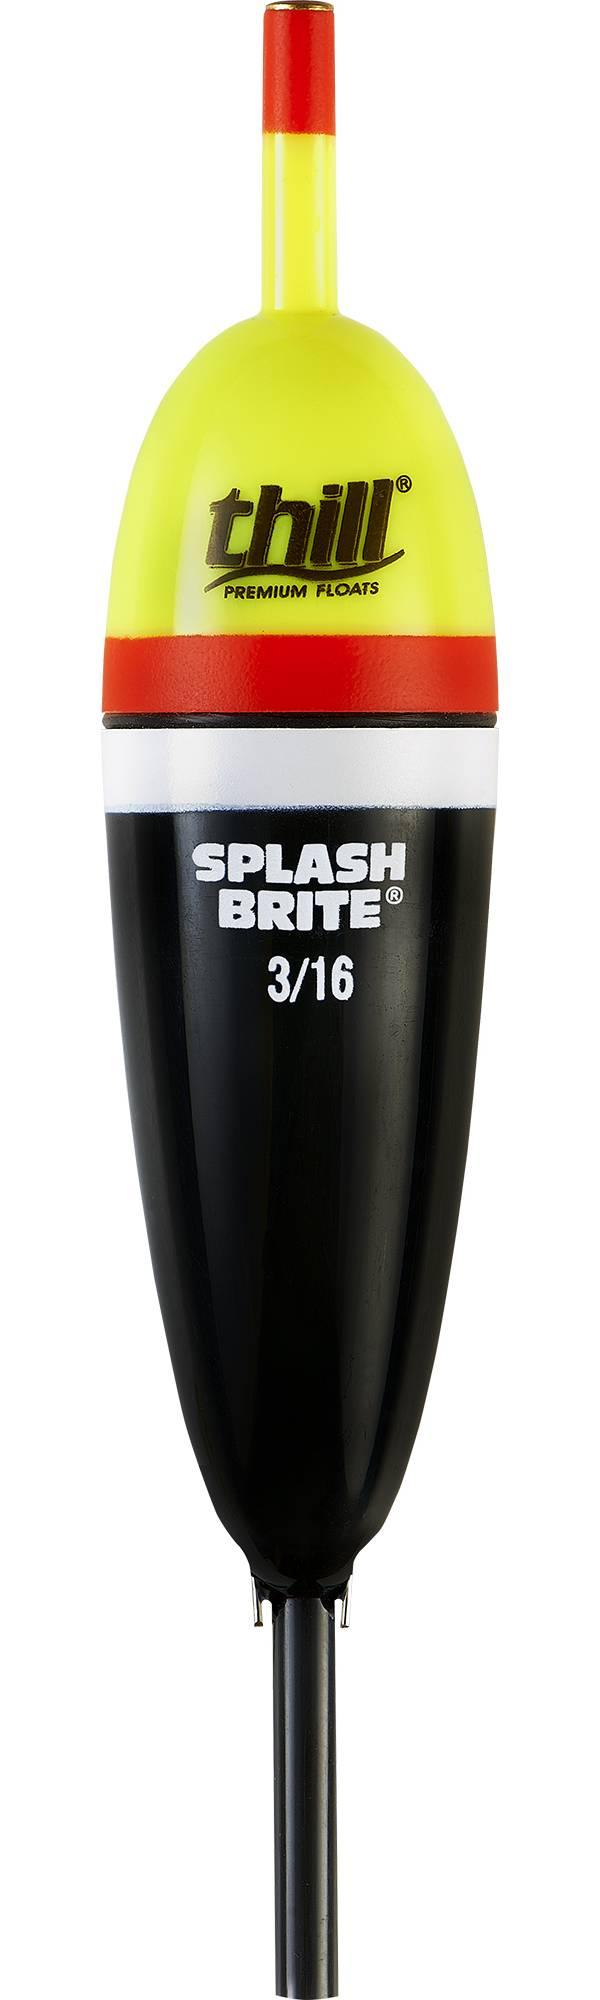 Thill Splash Brite Float product image